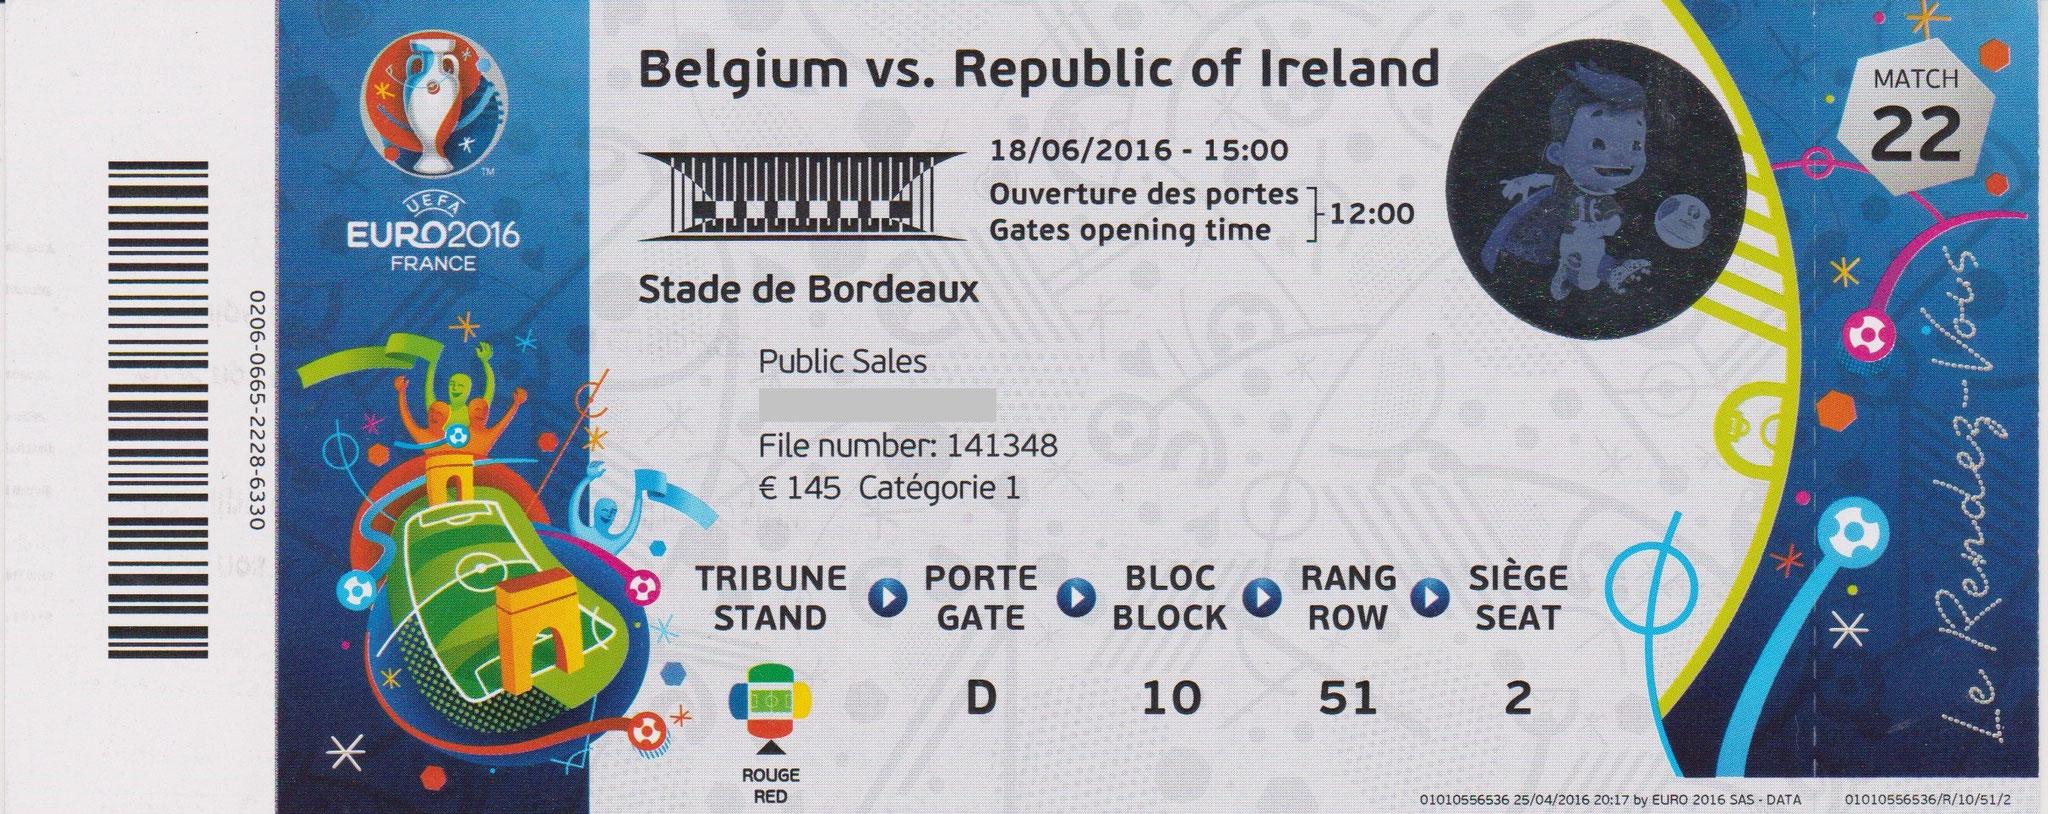 18/06/2016 Bordeaux : Belgique 3 - 0  Suède > Lukaku -2-, Wisel (Bel) <